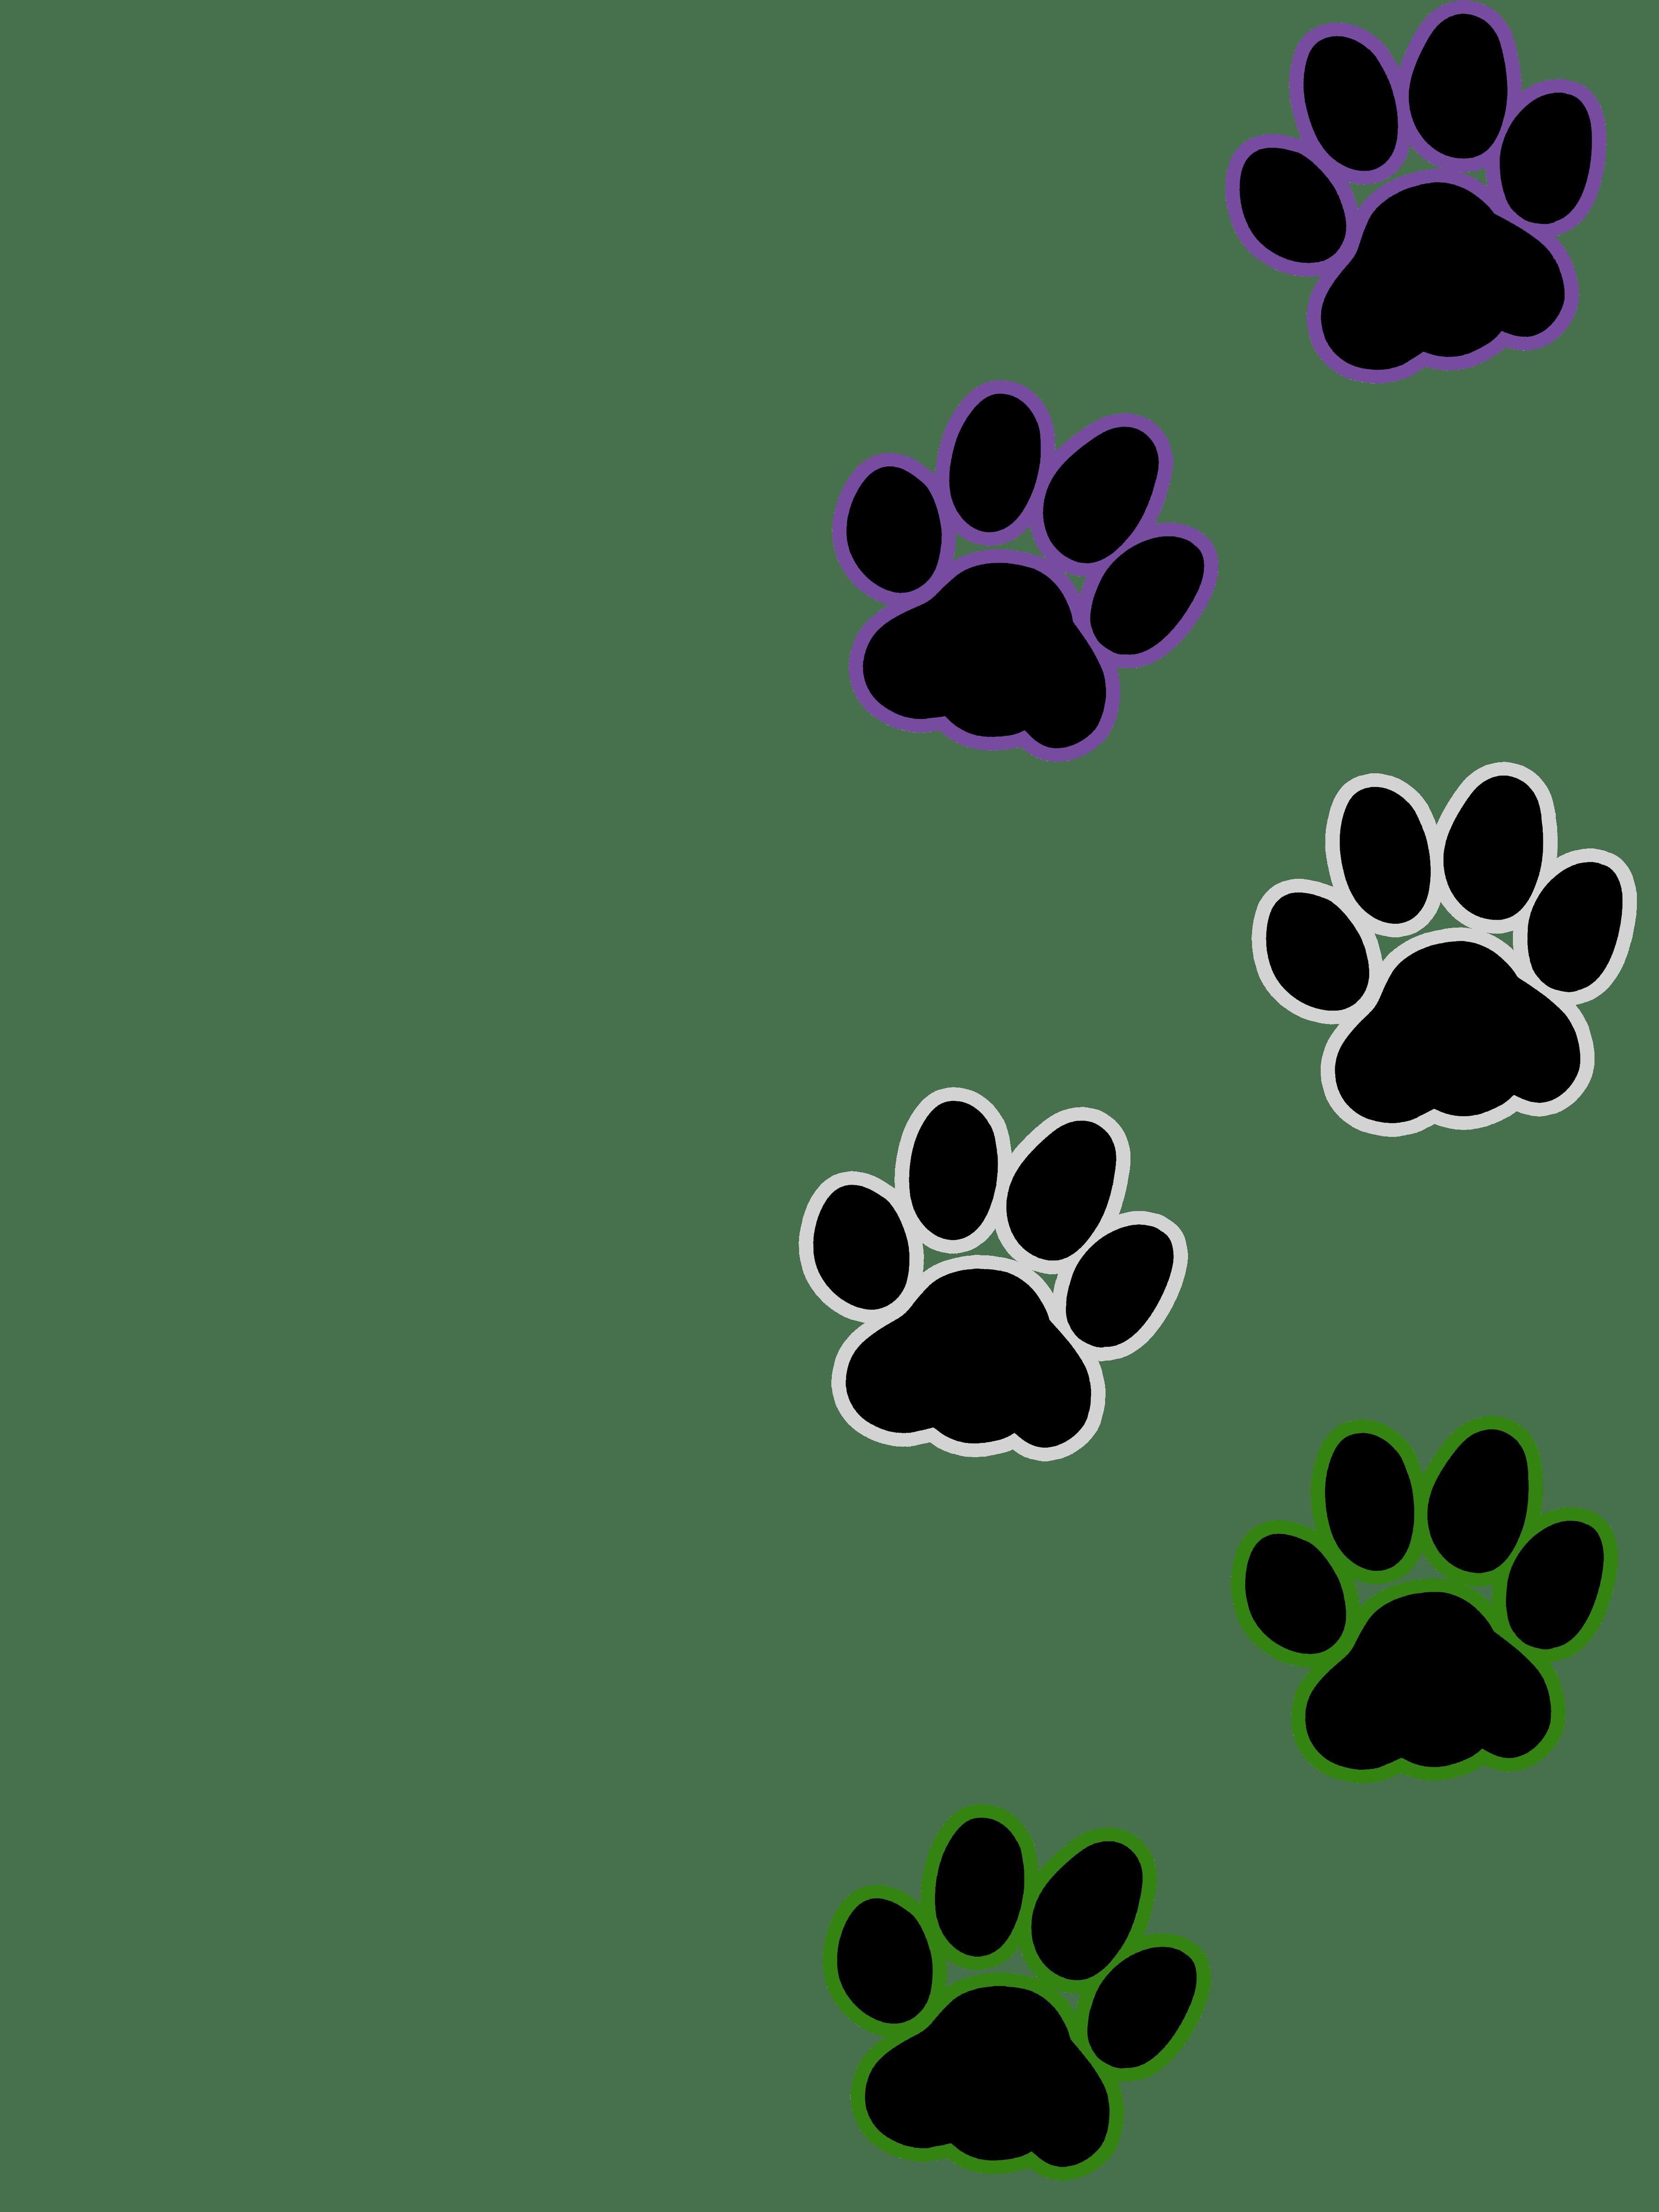 Cat pawprint clipart clipart transparent download Cat paw print - Genderqueer | Artworktee clipart transparent download